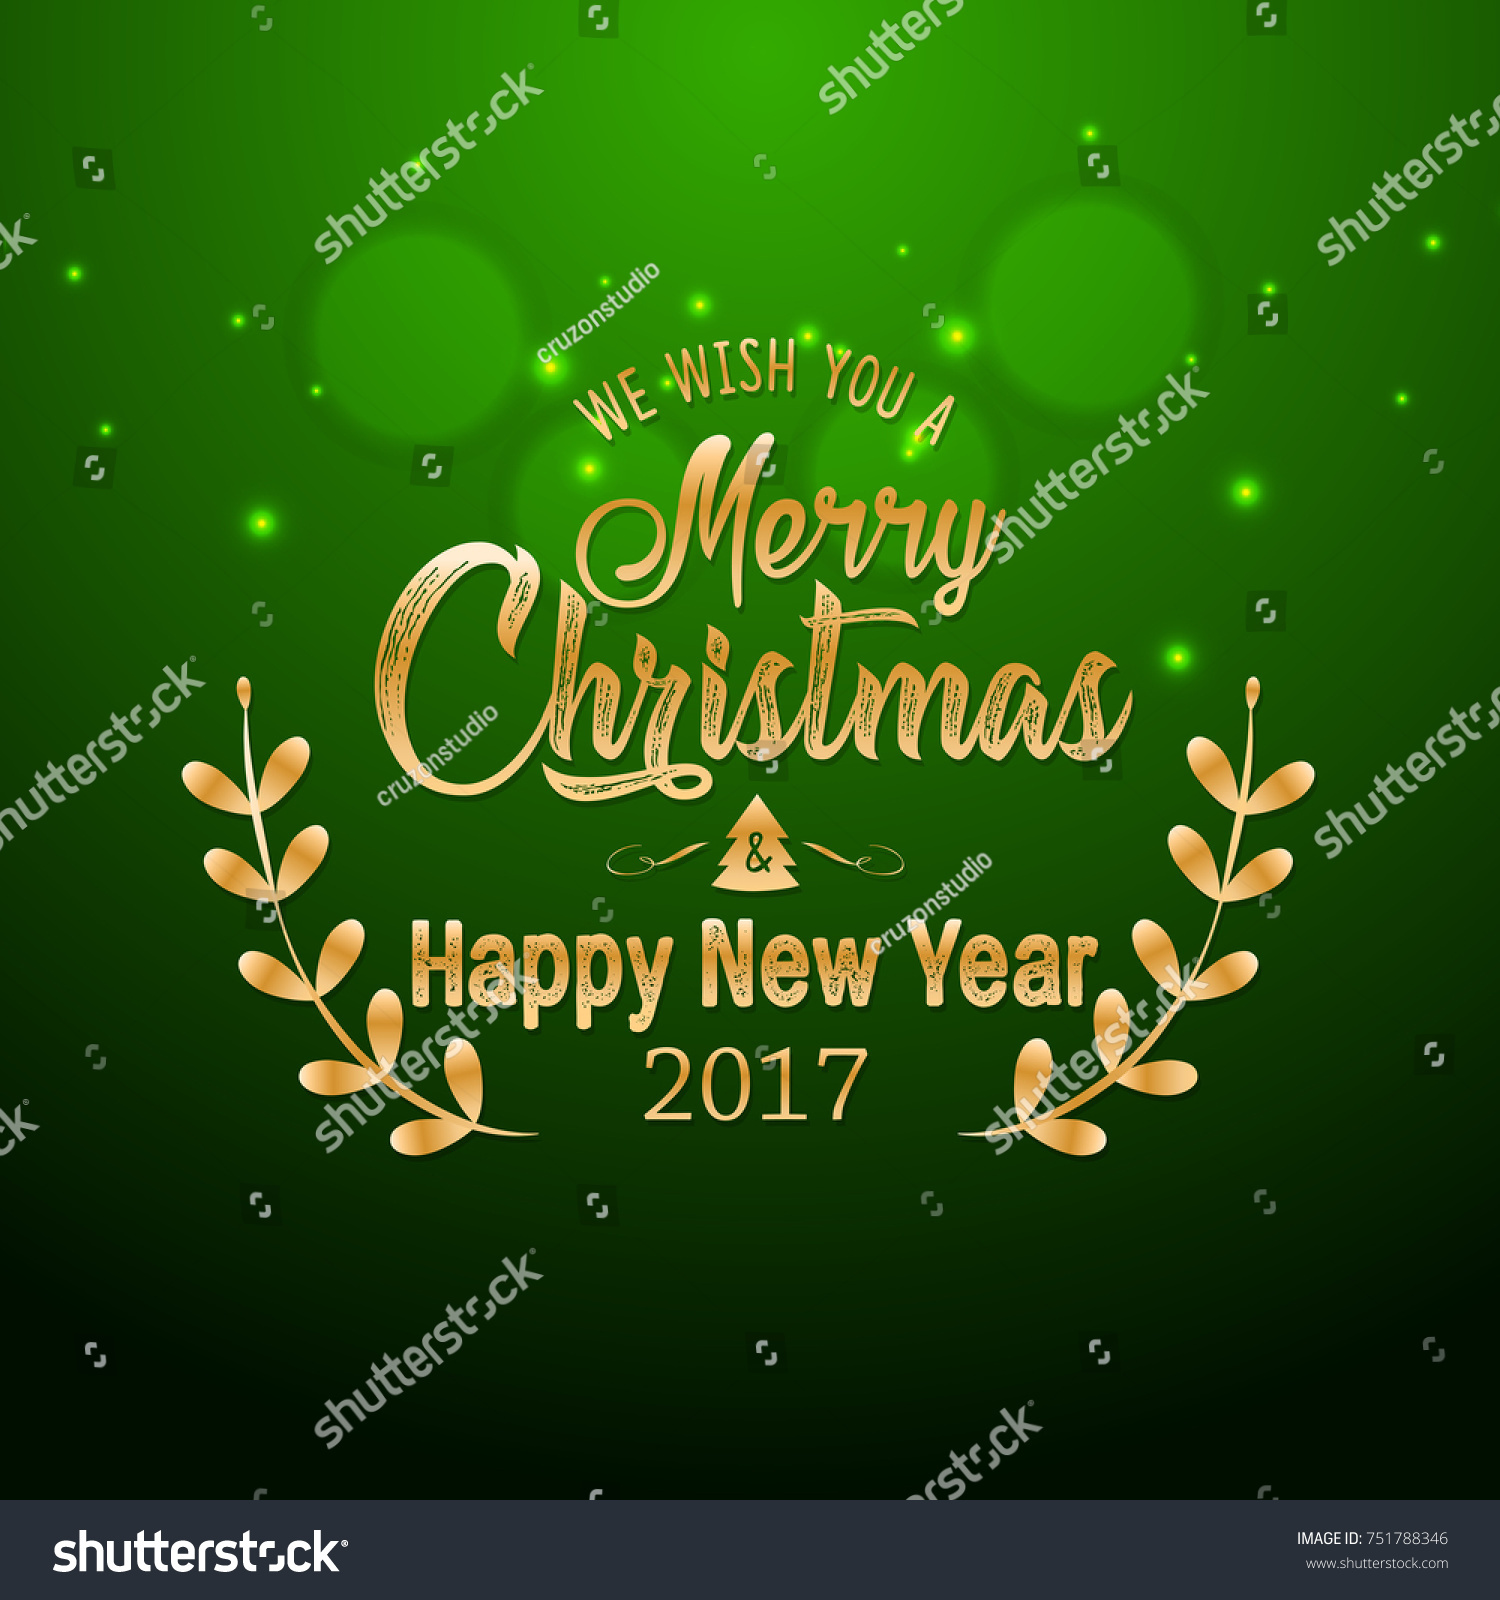 Merry Christmas Happy New Year 2017 Stock Vector 751788346 ...